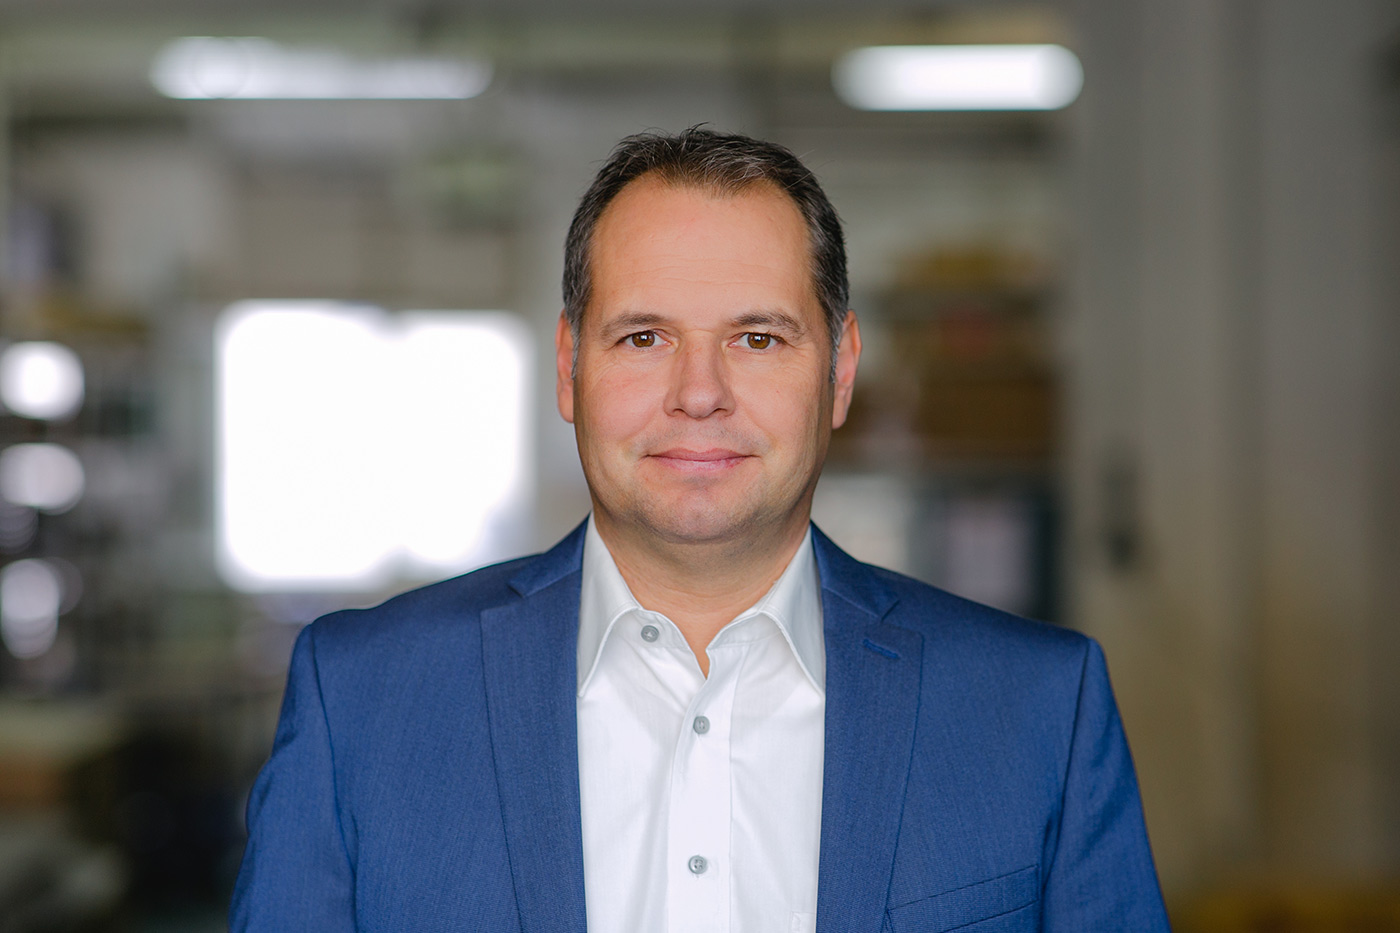 Patrick Nöll